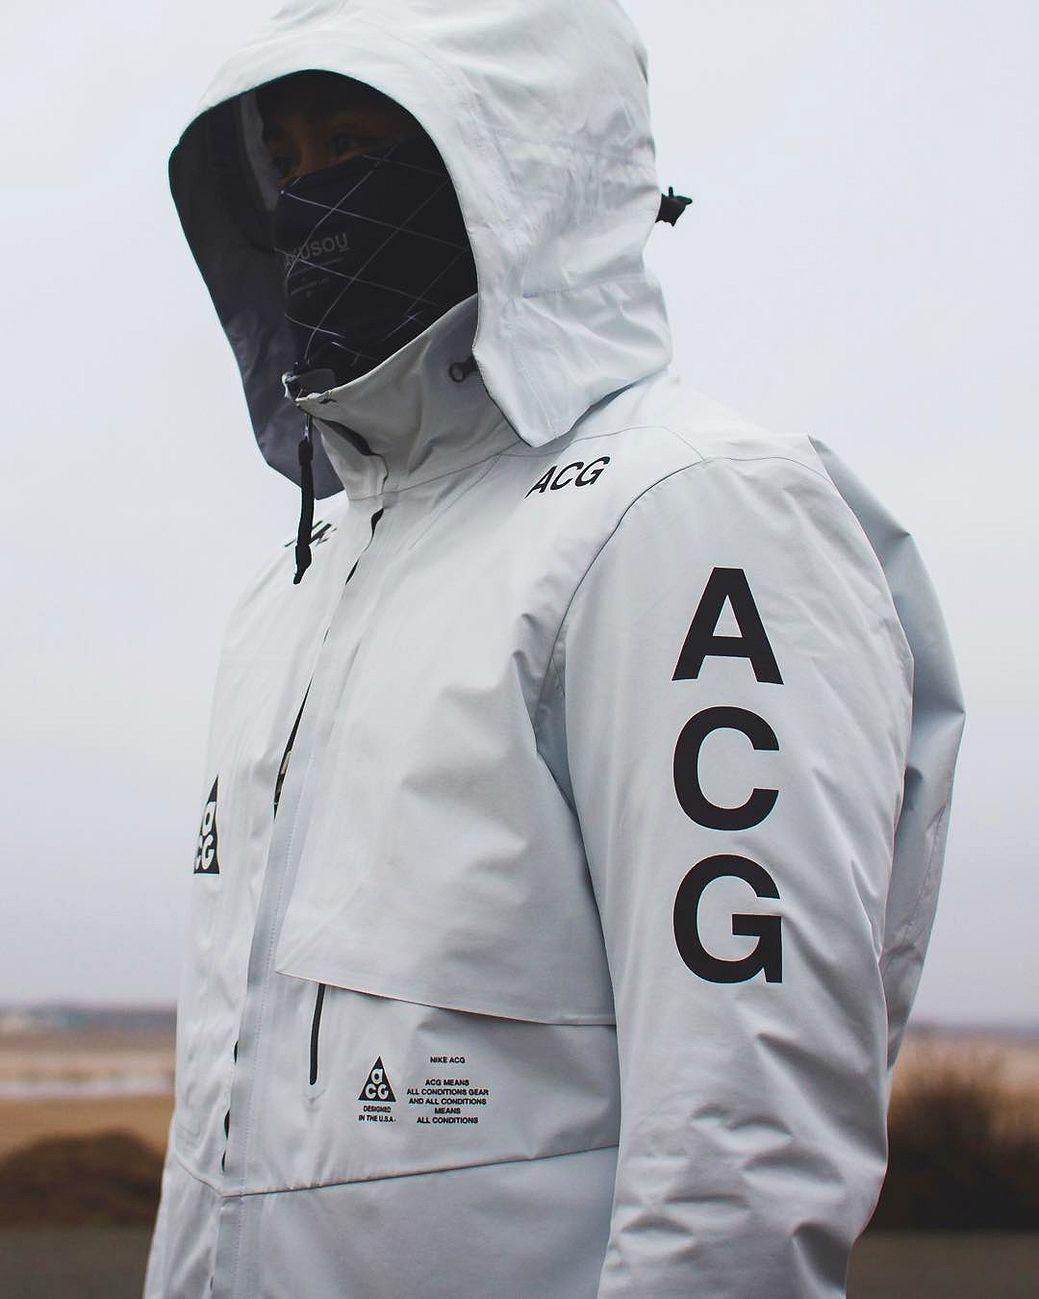 Nike ACG GORE TEX Men's Jacket.